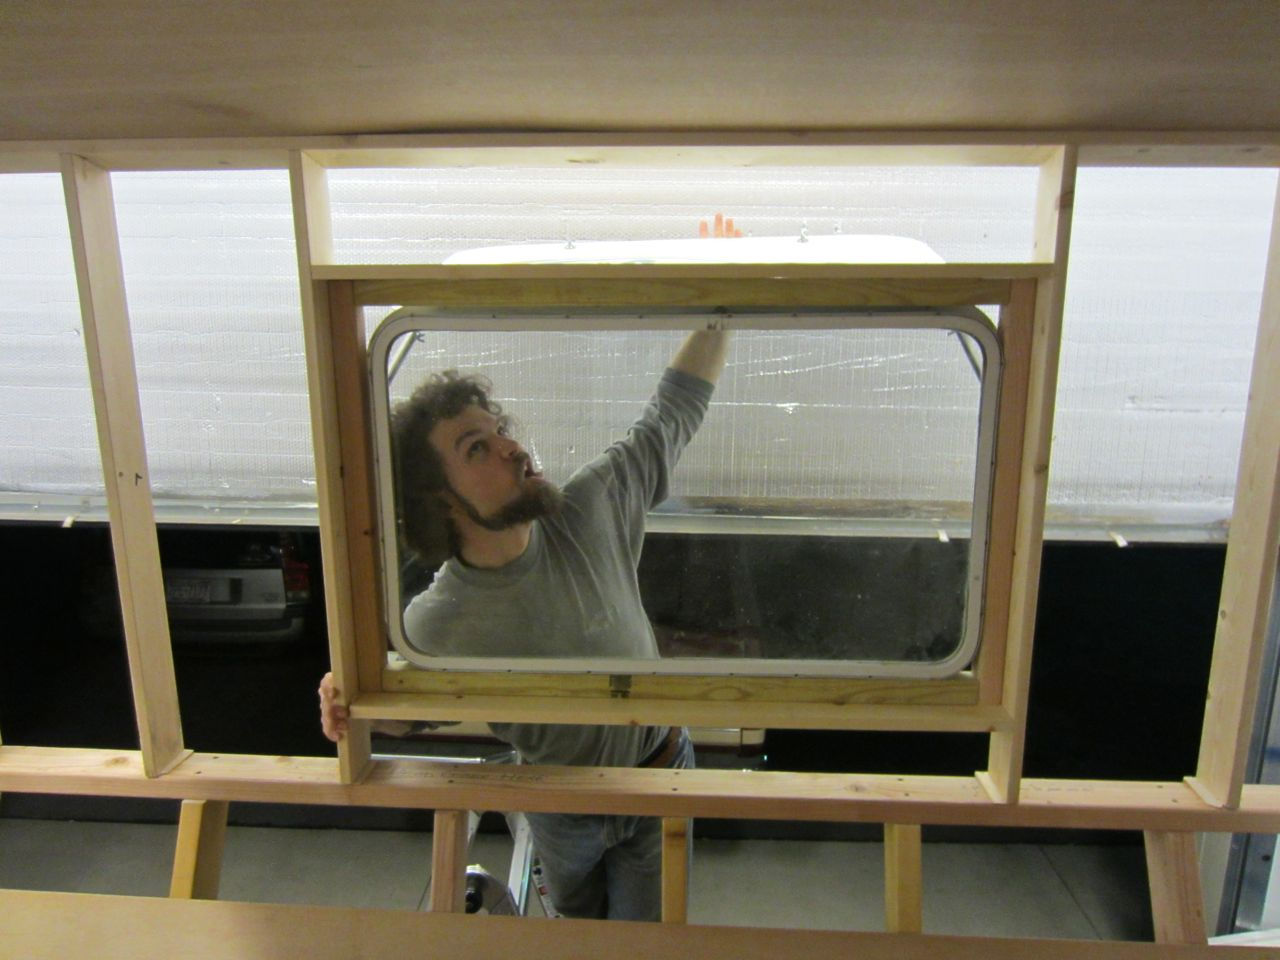 We have a new bedroom window!